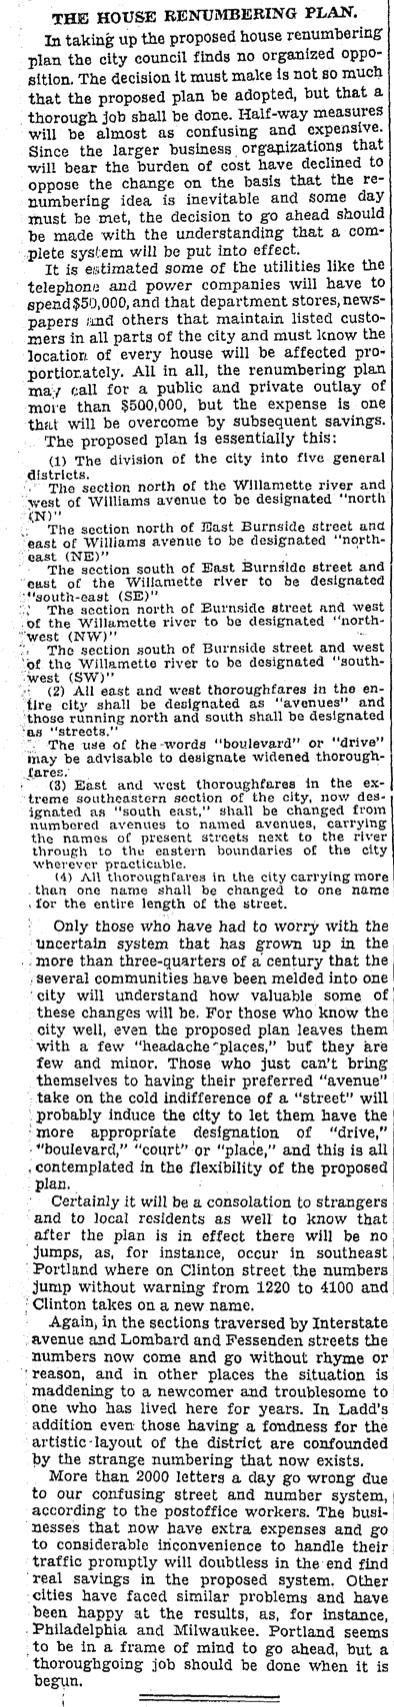 5-13-1931 Editorial